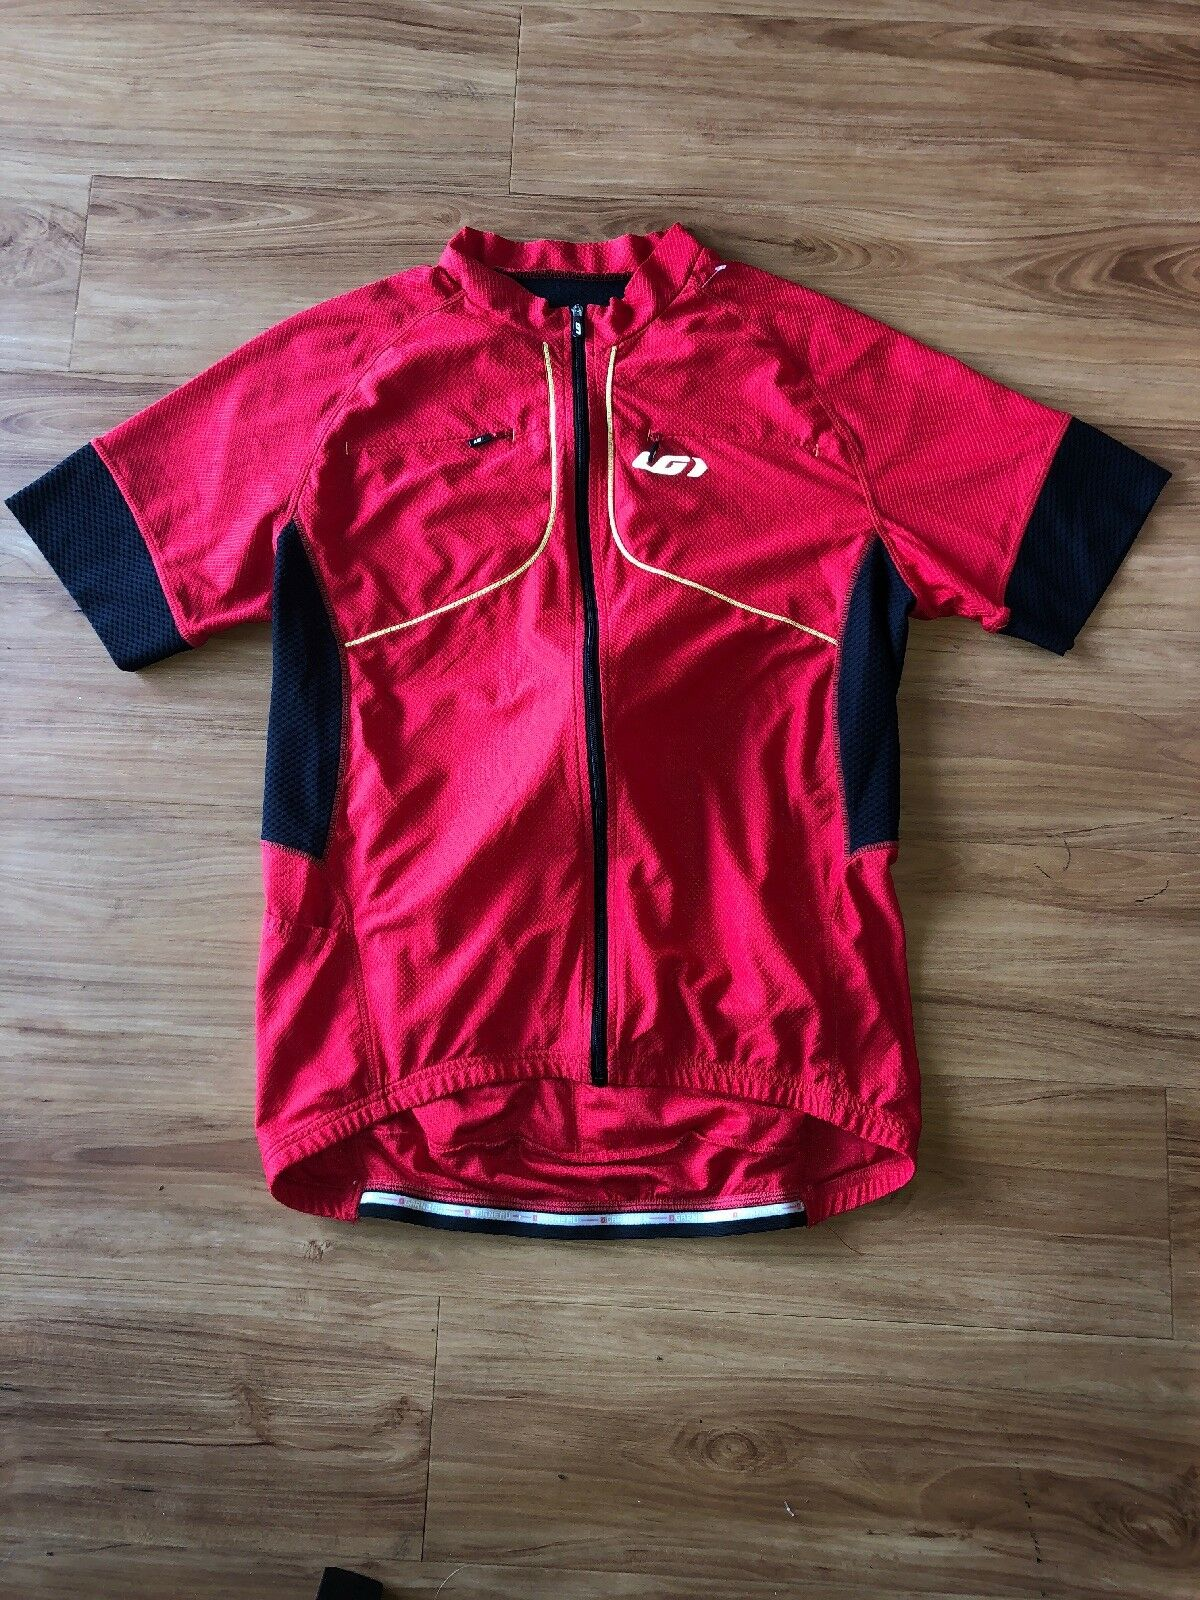 Louis Garneau Cycling Jersey Mens XL